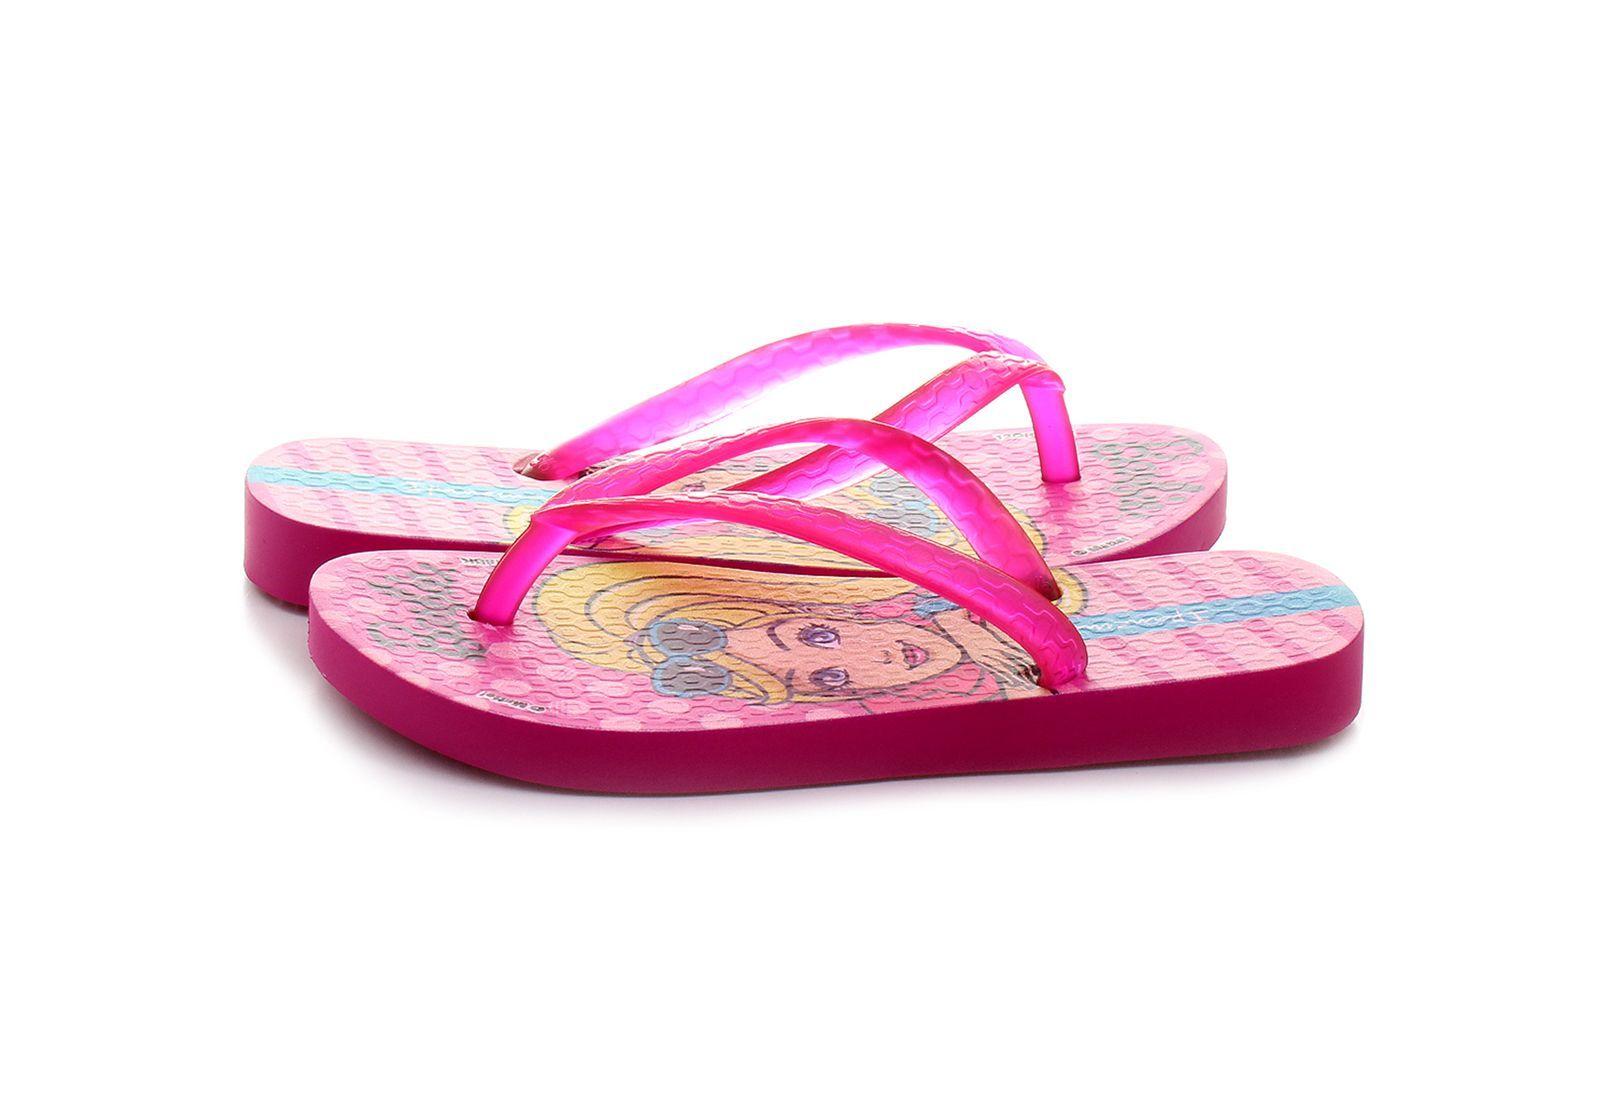 21762b01d4e Ipanema Šľapky - Barbie Kids - 35614-20791 - Tenisky